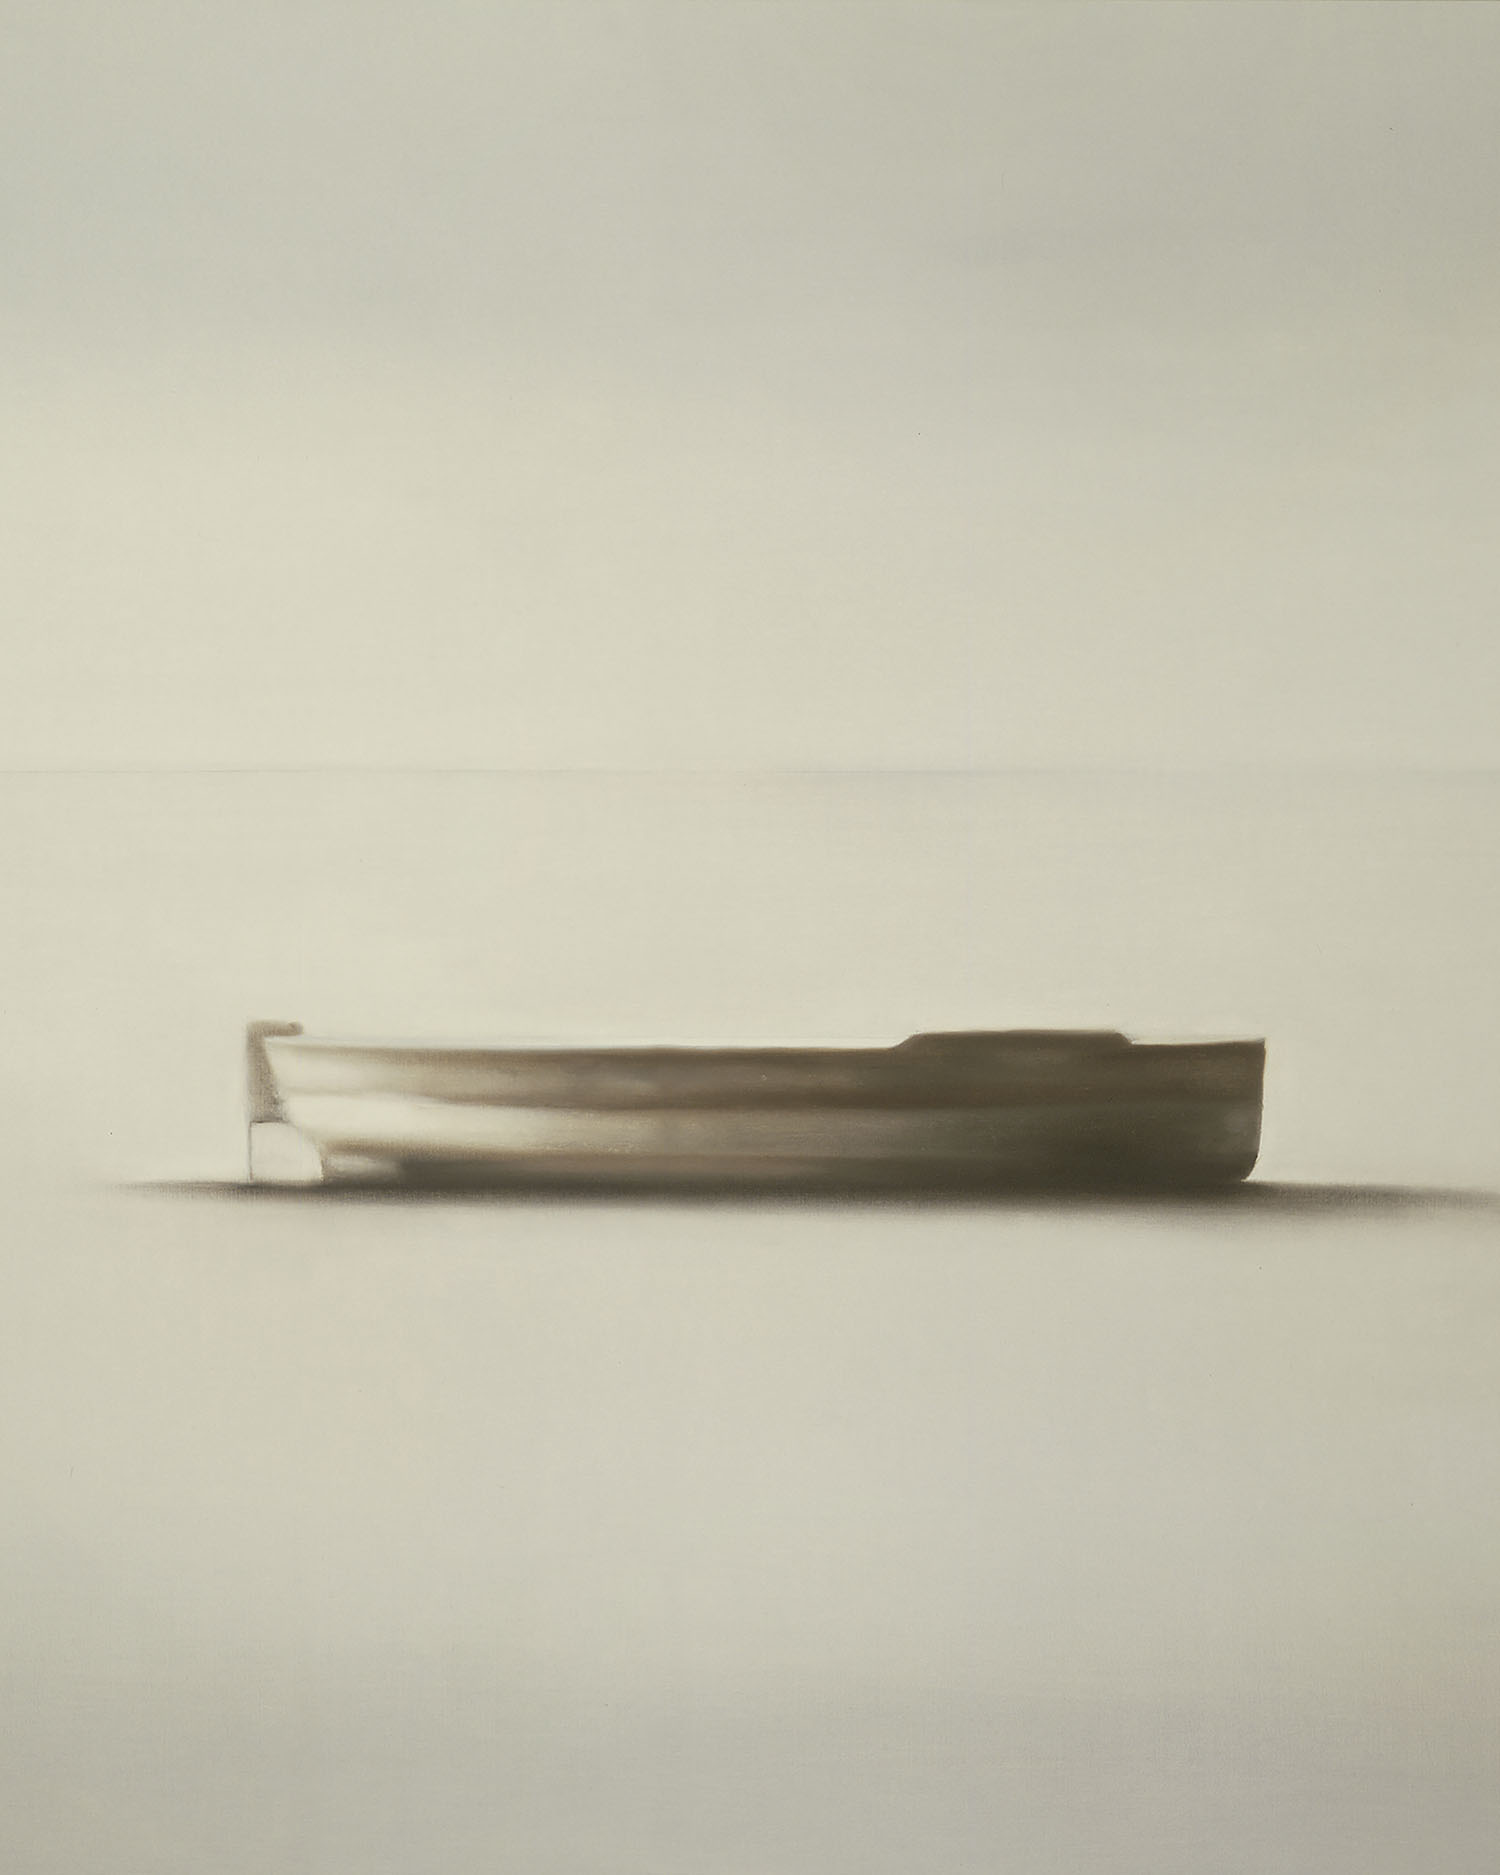 Barca. Josep Navarro Vives. 1986, oli sobre tela, cm 97 x 160.